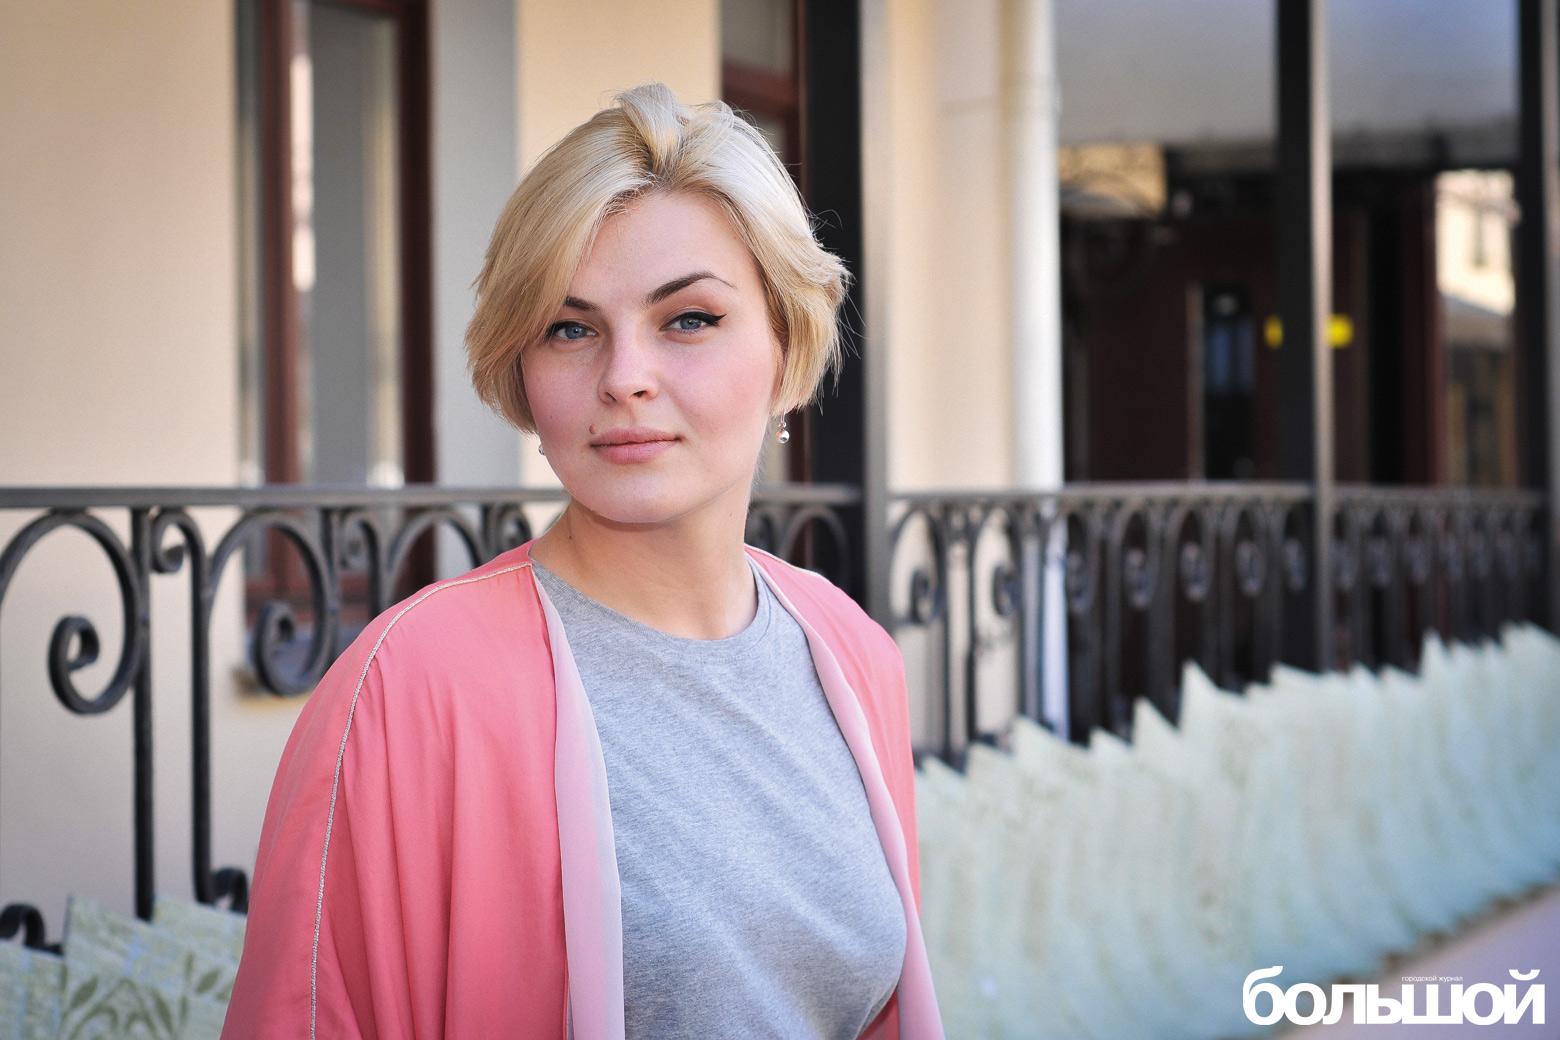 софия курносова